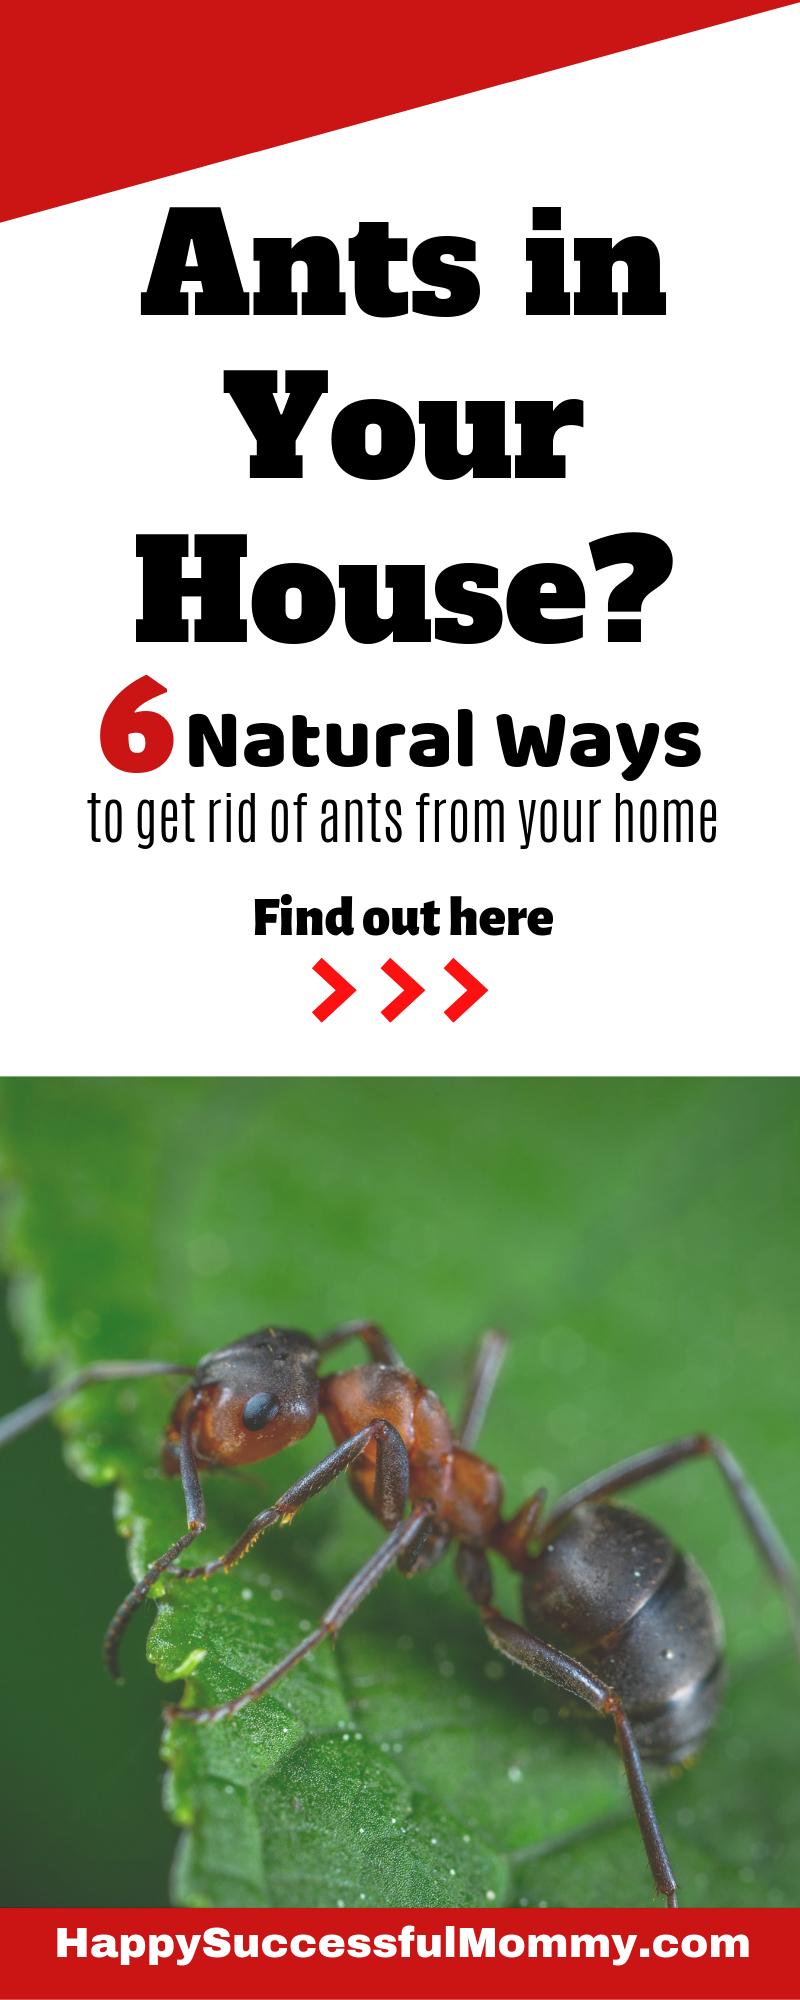 Need To Get Rid Of Ants Get Rid Of Ants Rid Of Ants Ant Remedies